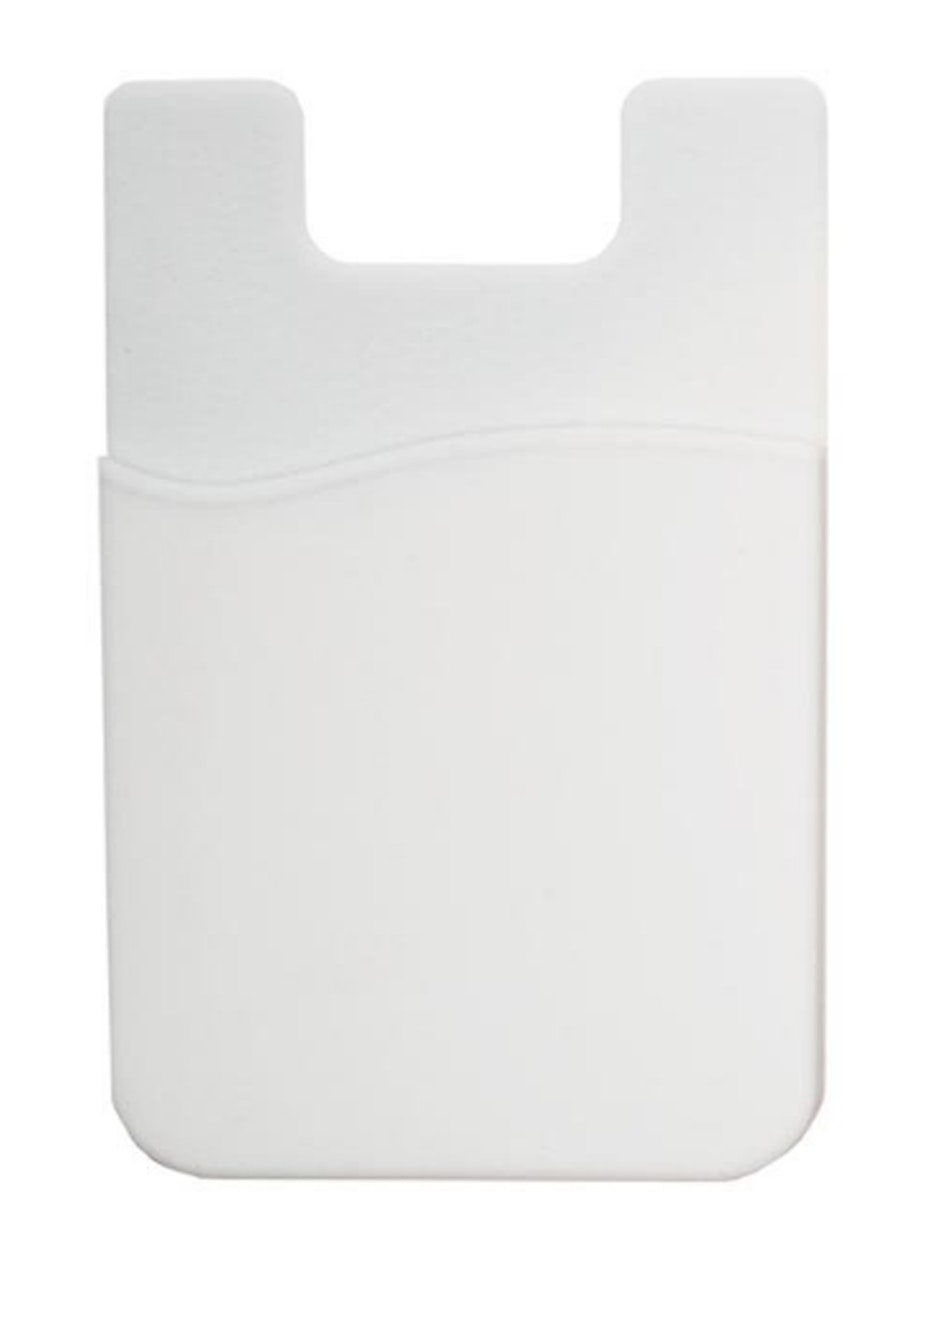 Smart Wallet - White